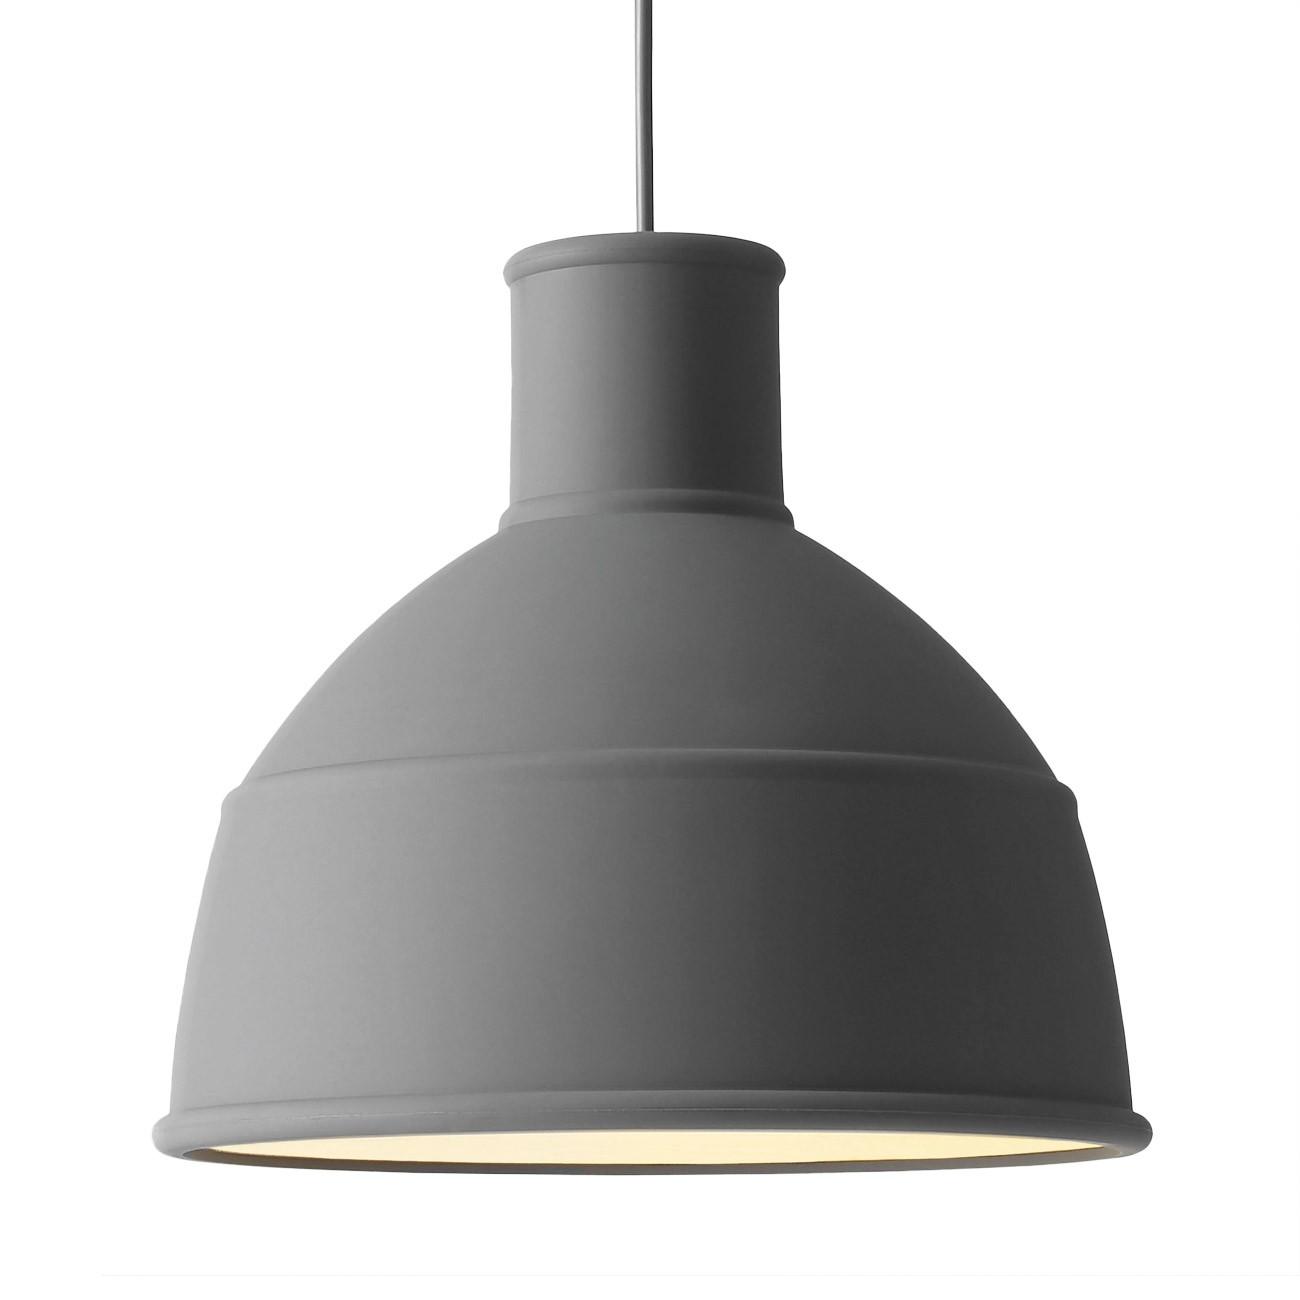 muuto unfold h ngeleuchte grau 32 5 cm 09001 m bel lampen leuchten pendelleuchten. Black Bedroom Furniture Sets. Home Design Ideas